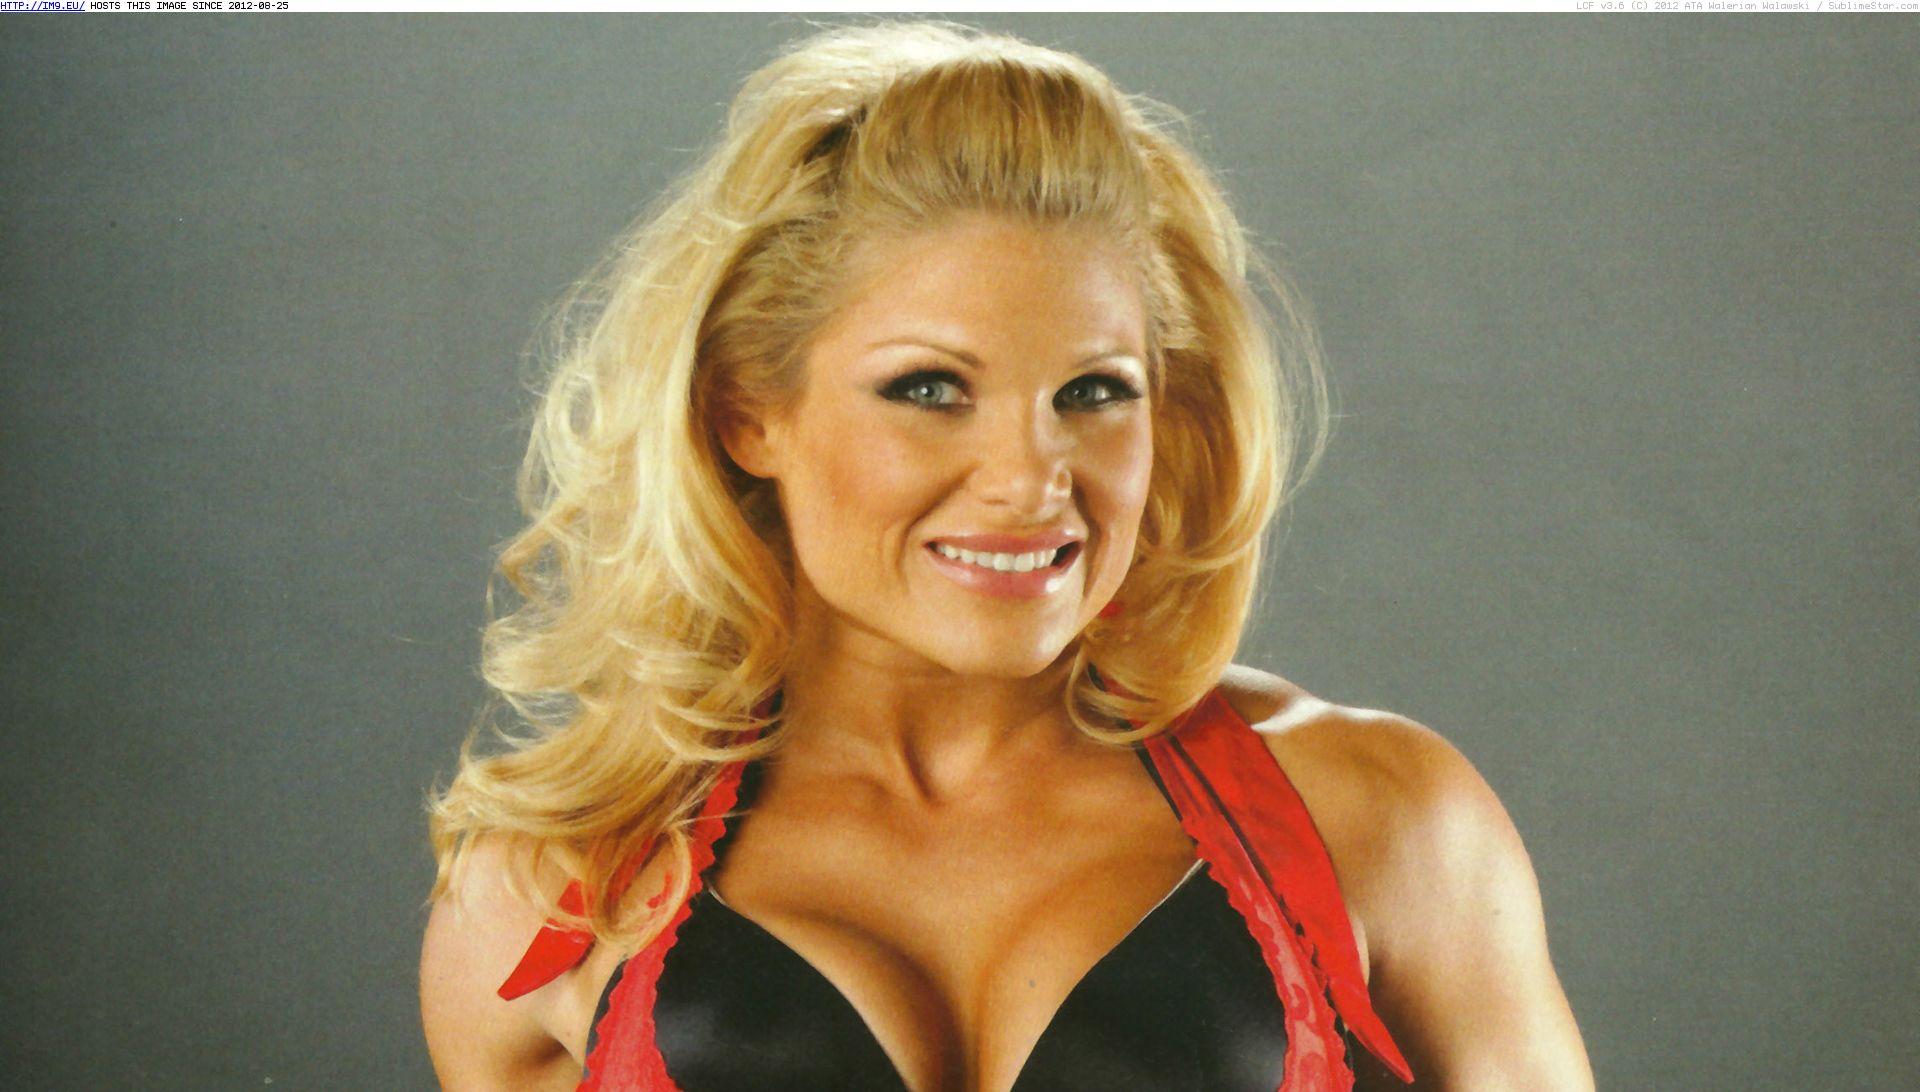 WWE Super Hot Divas Full HD Wallpapers Beth Phoenix wallpaper 3 1920x1092